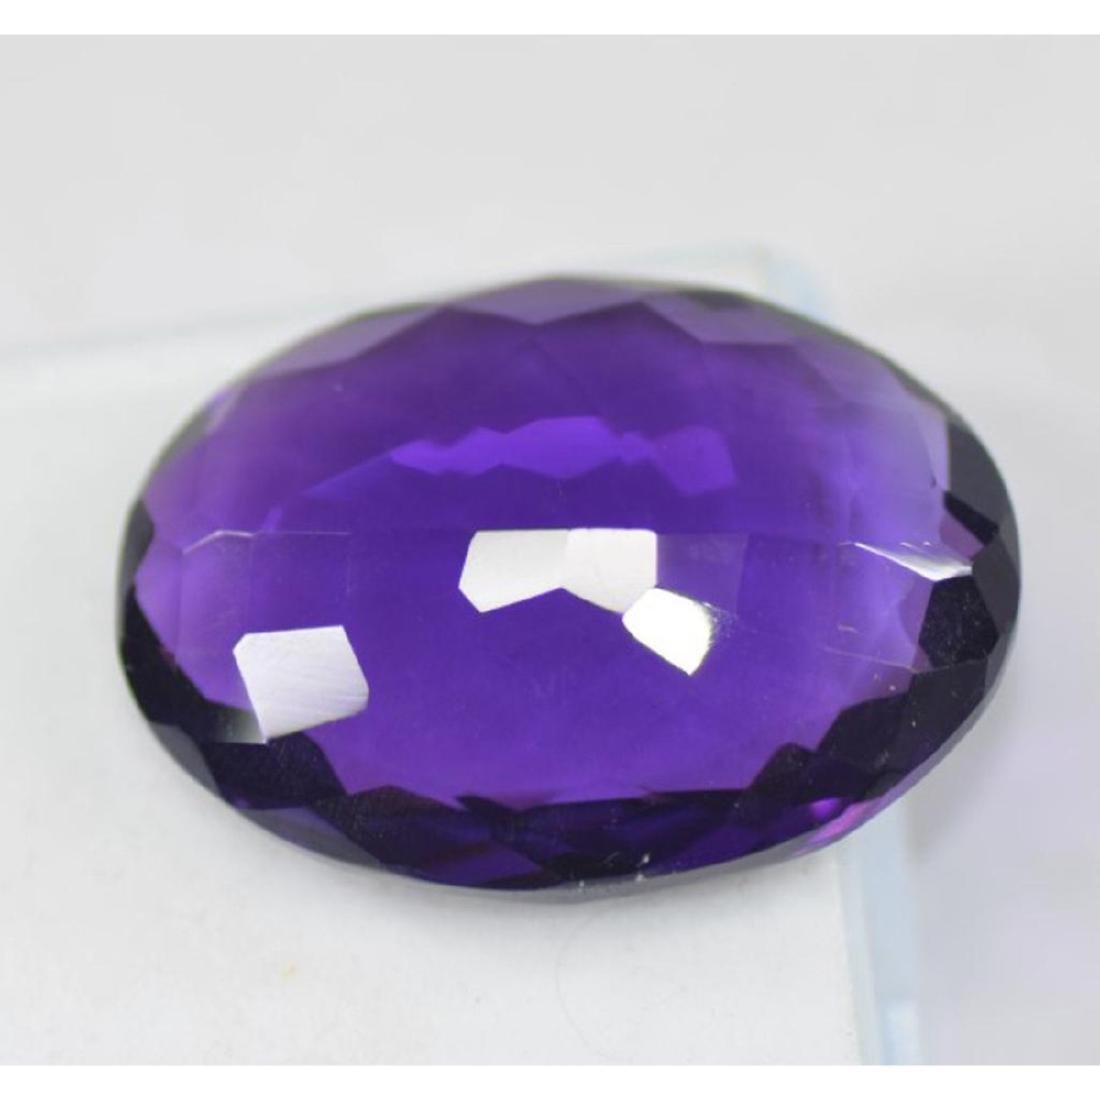 37.05 Carat Oval Cut EGL Certified Violet Amethyst - 3